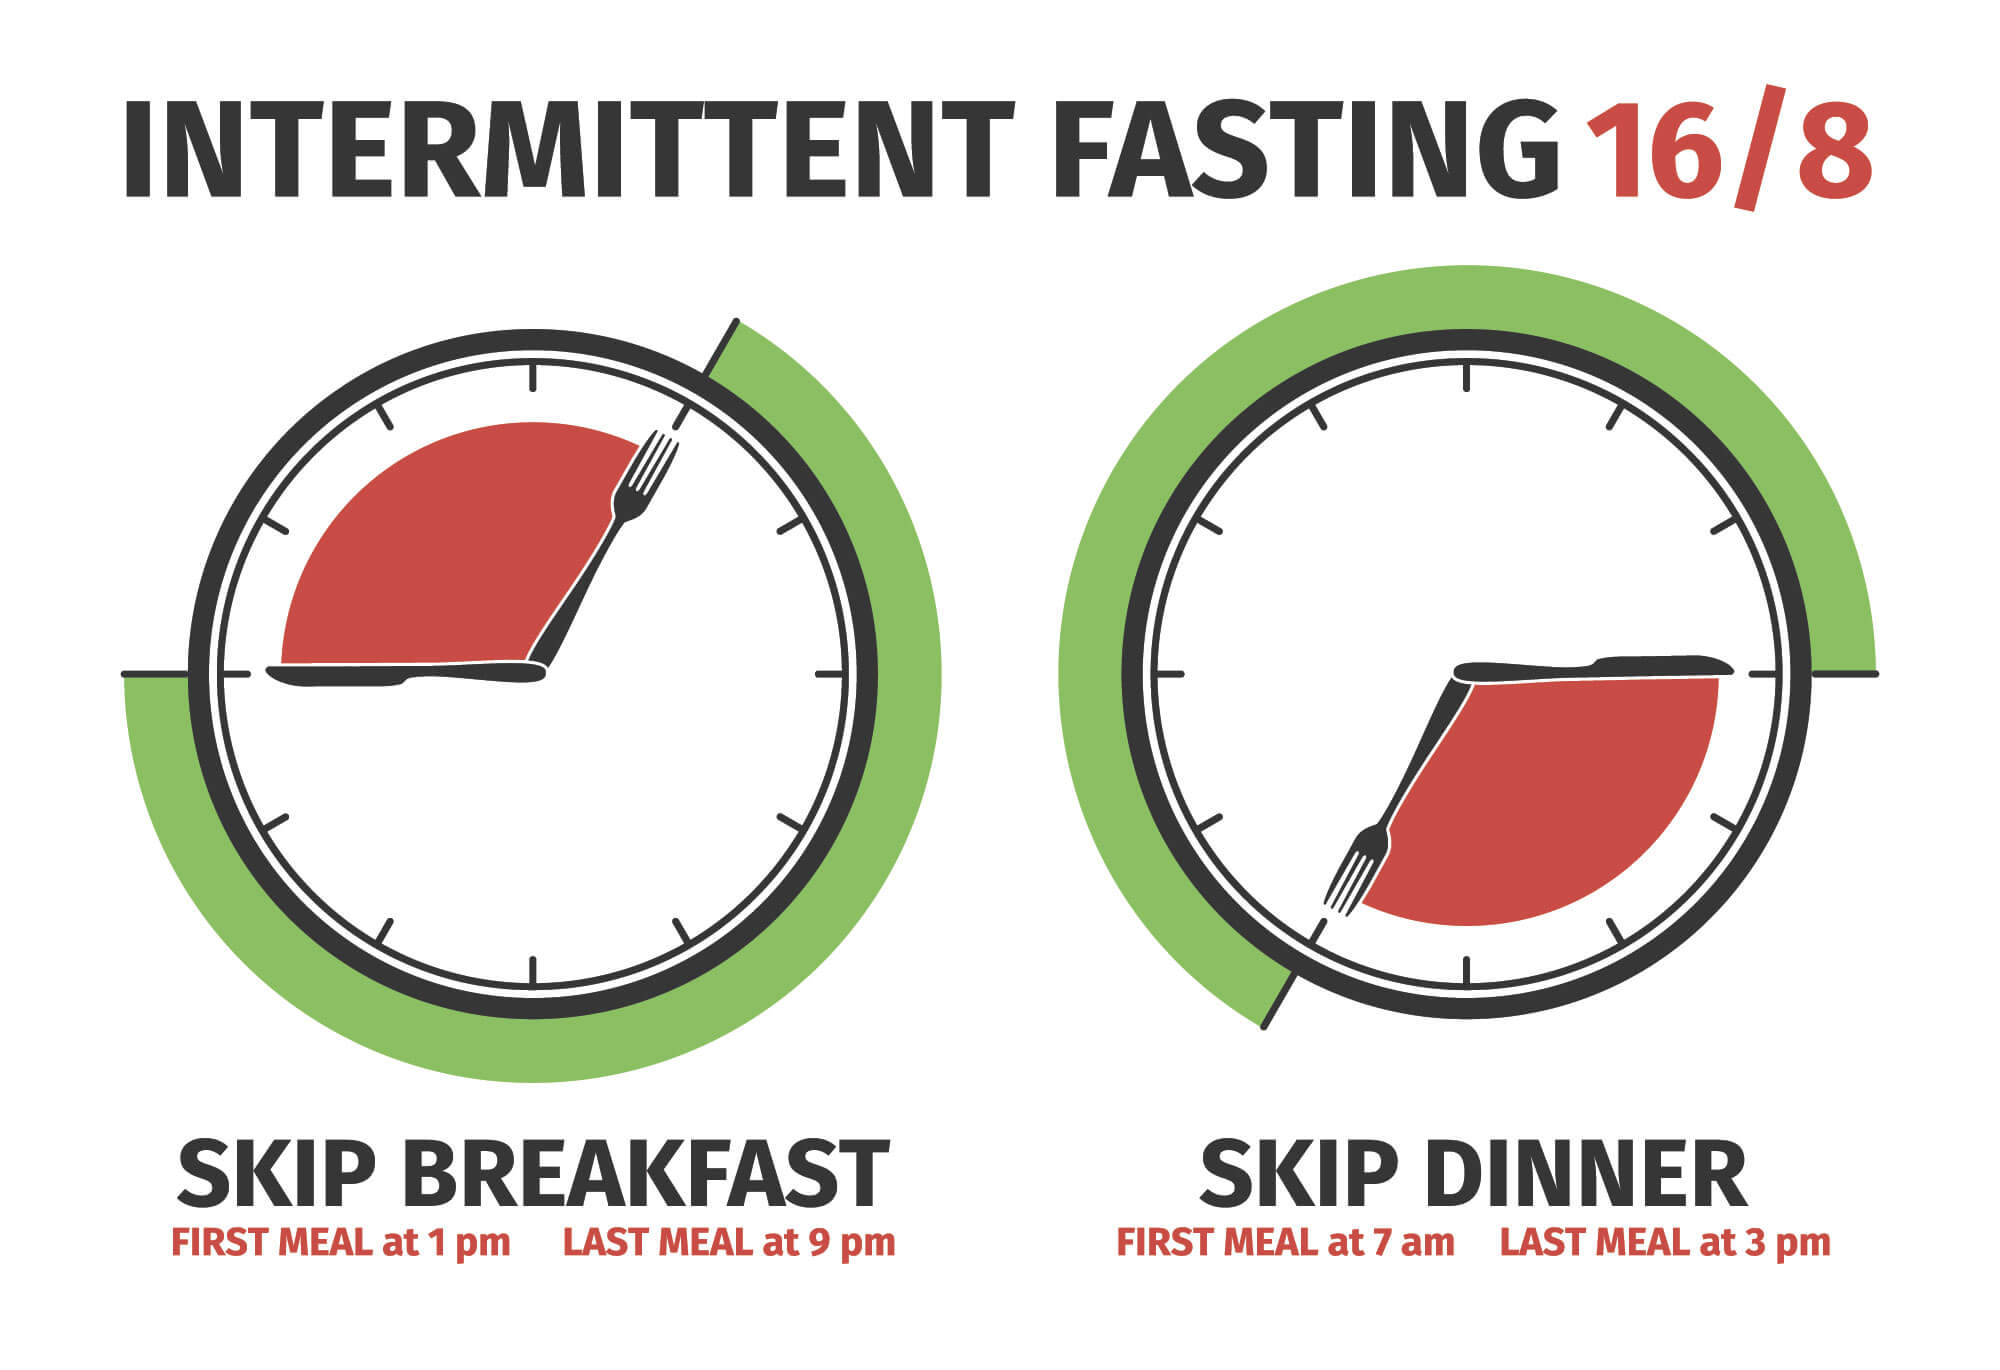 Intermitten Fasting 16/8